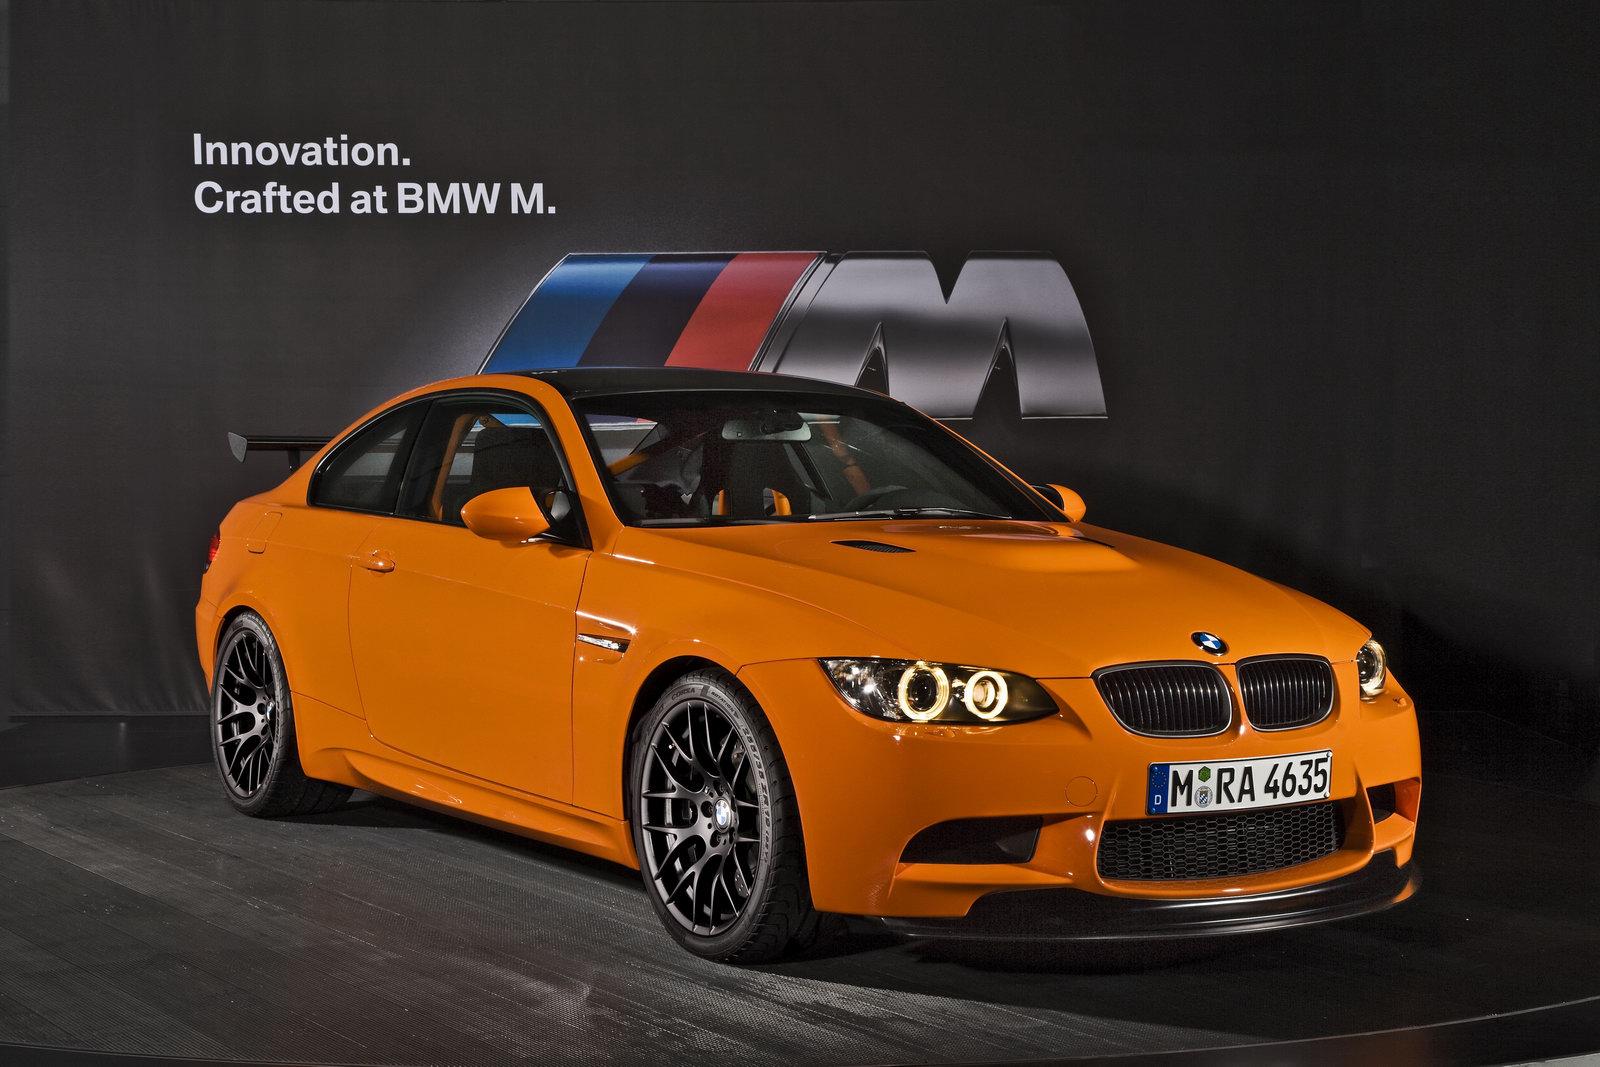 E92 BMW M3 GTS